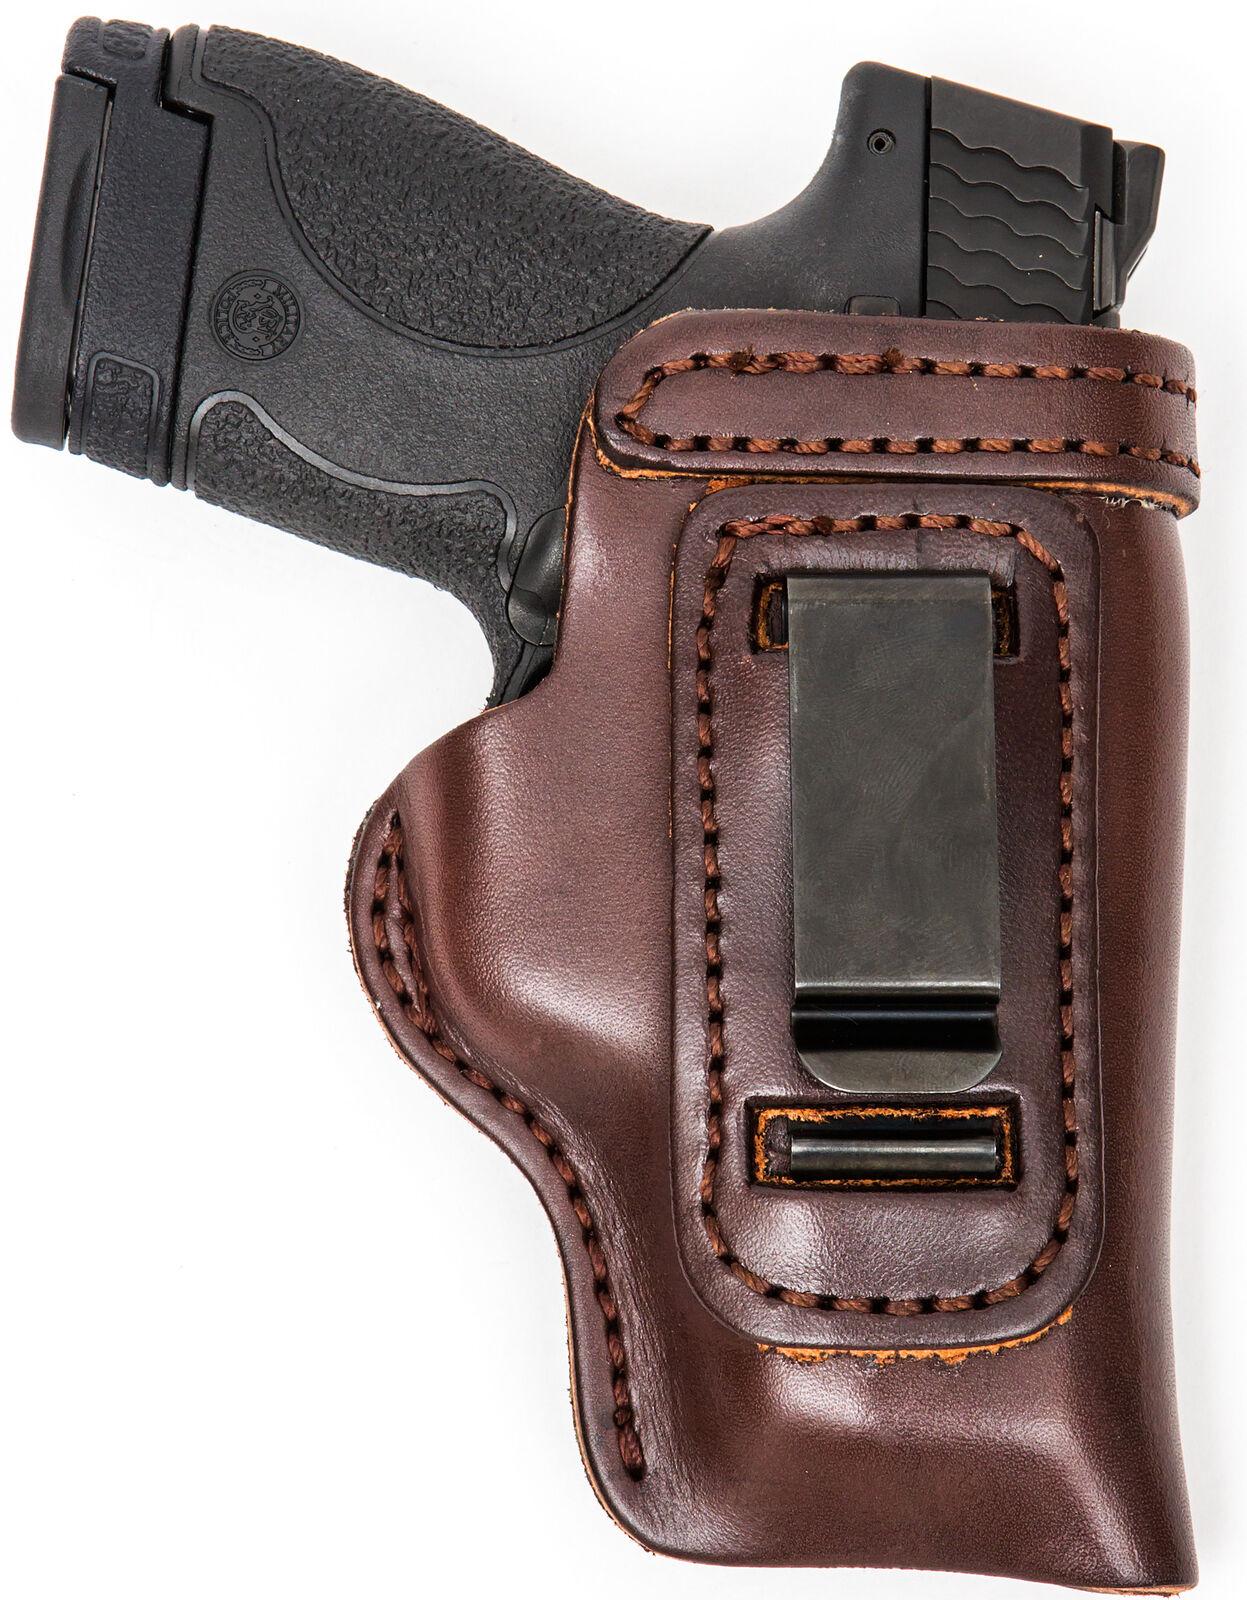 HD HD HD Concealed RH LH OWB IWB Leder Gun Holster For Sig Sauer Mosquito c6c5fb